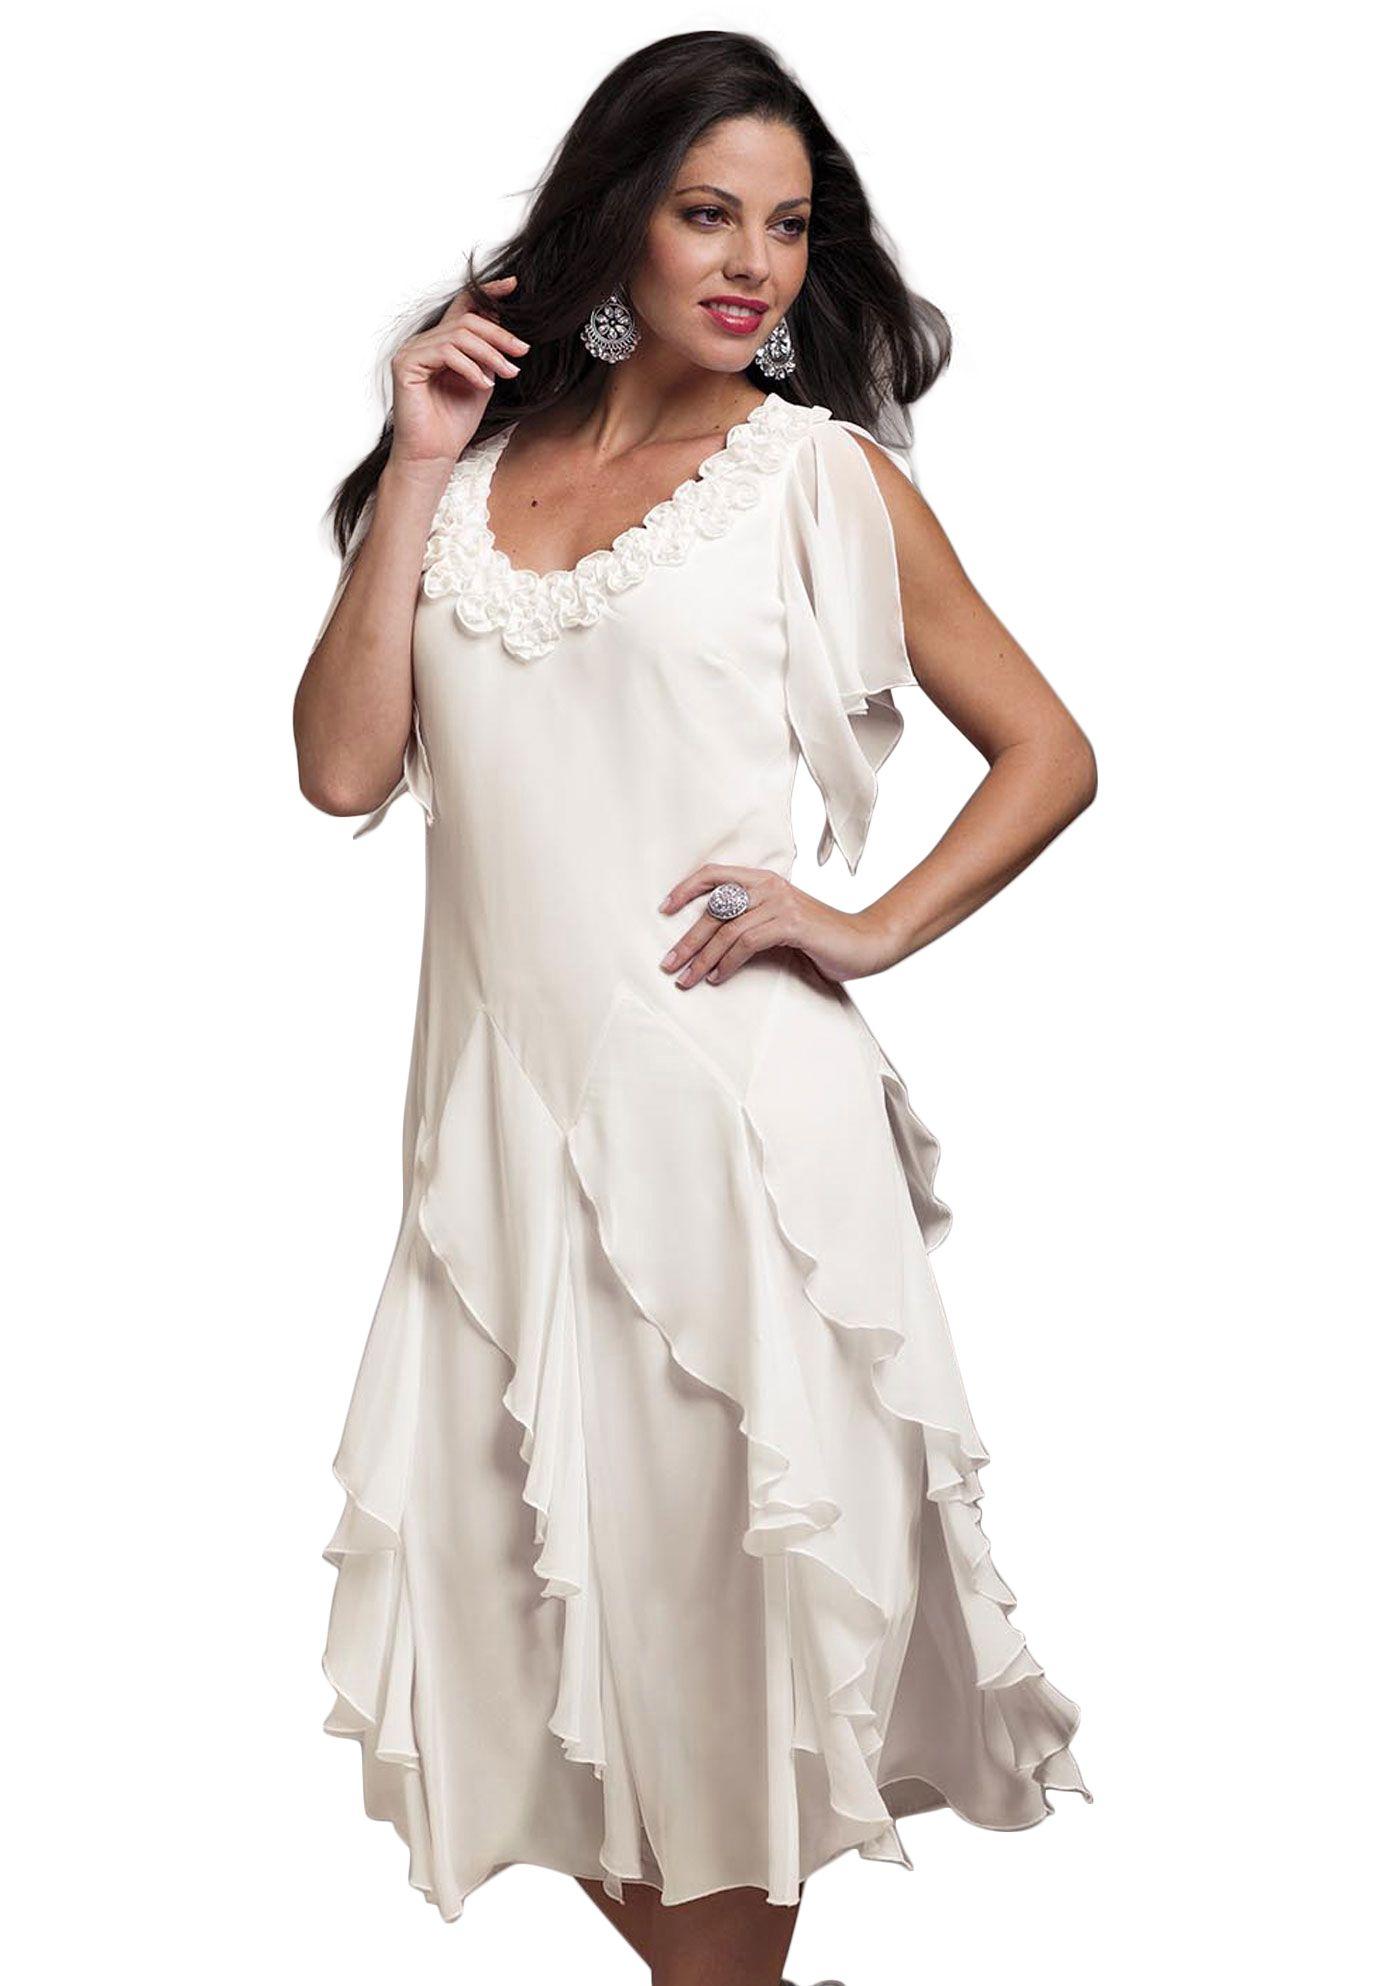 7fd4dbdf624 Plus Size Clothing  Dresses for Women